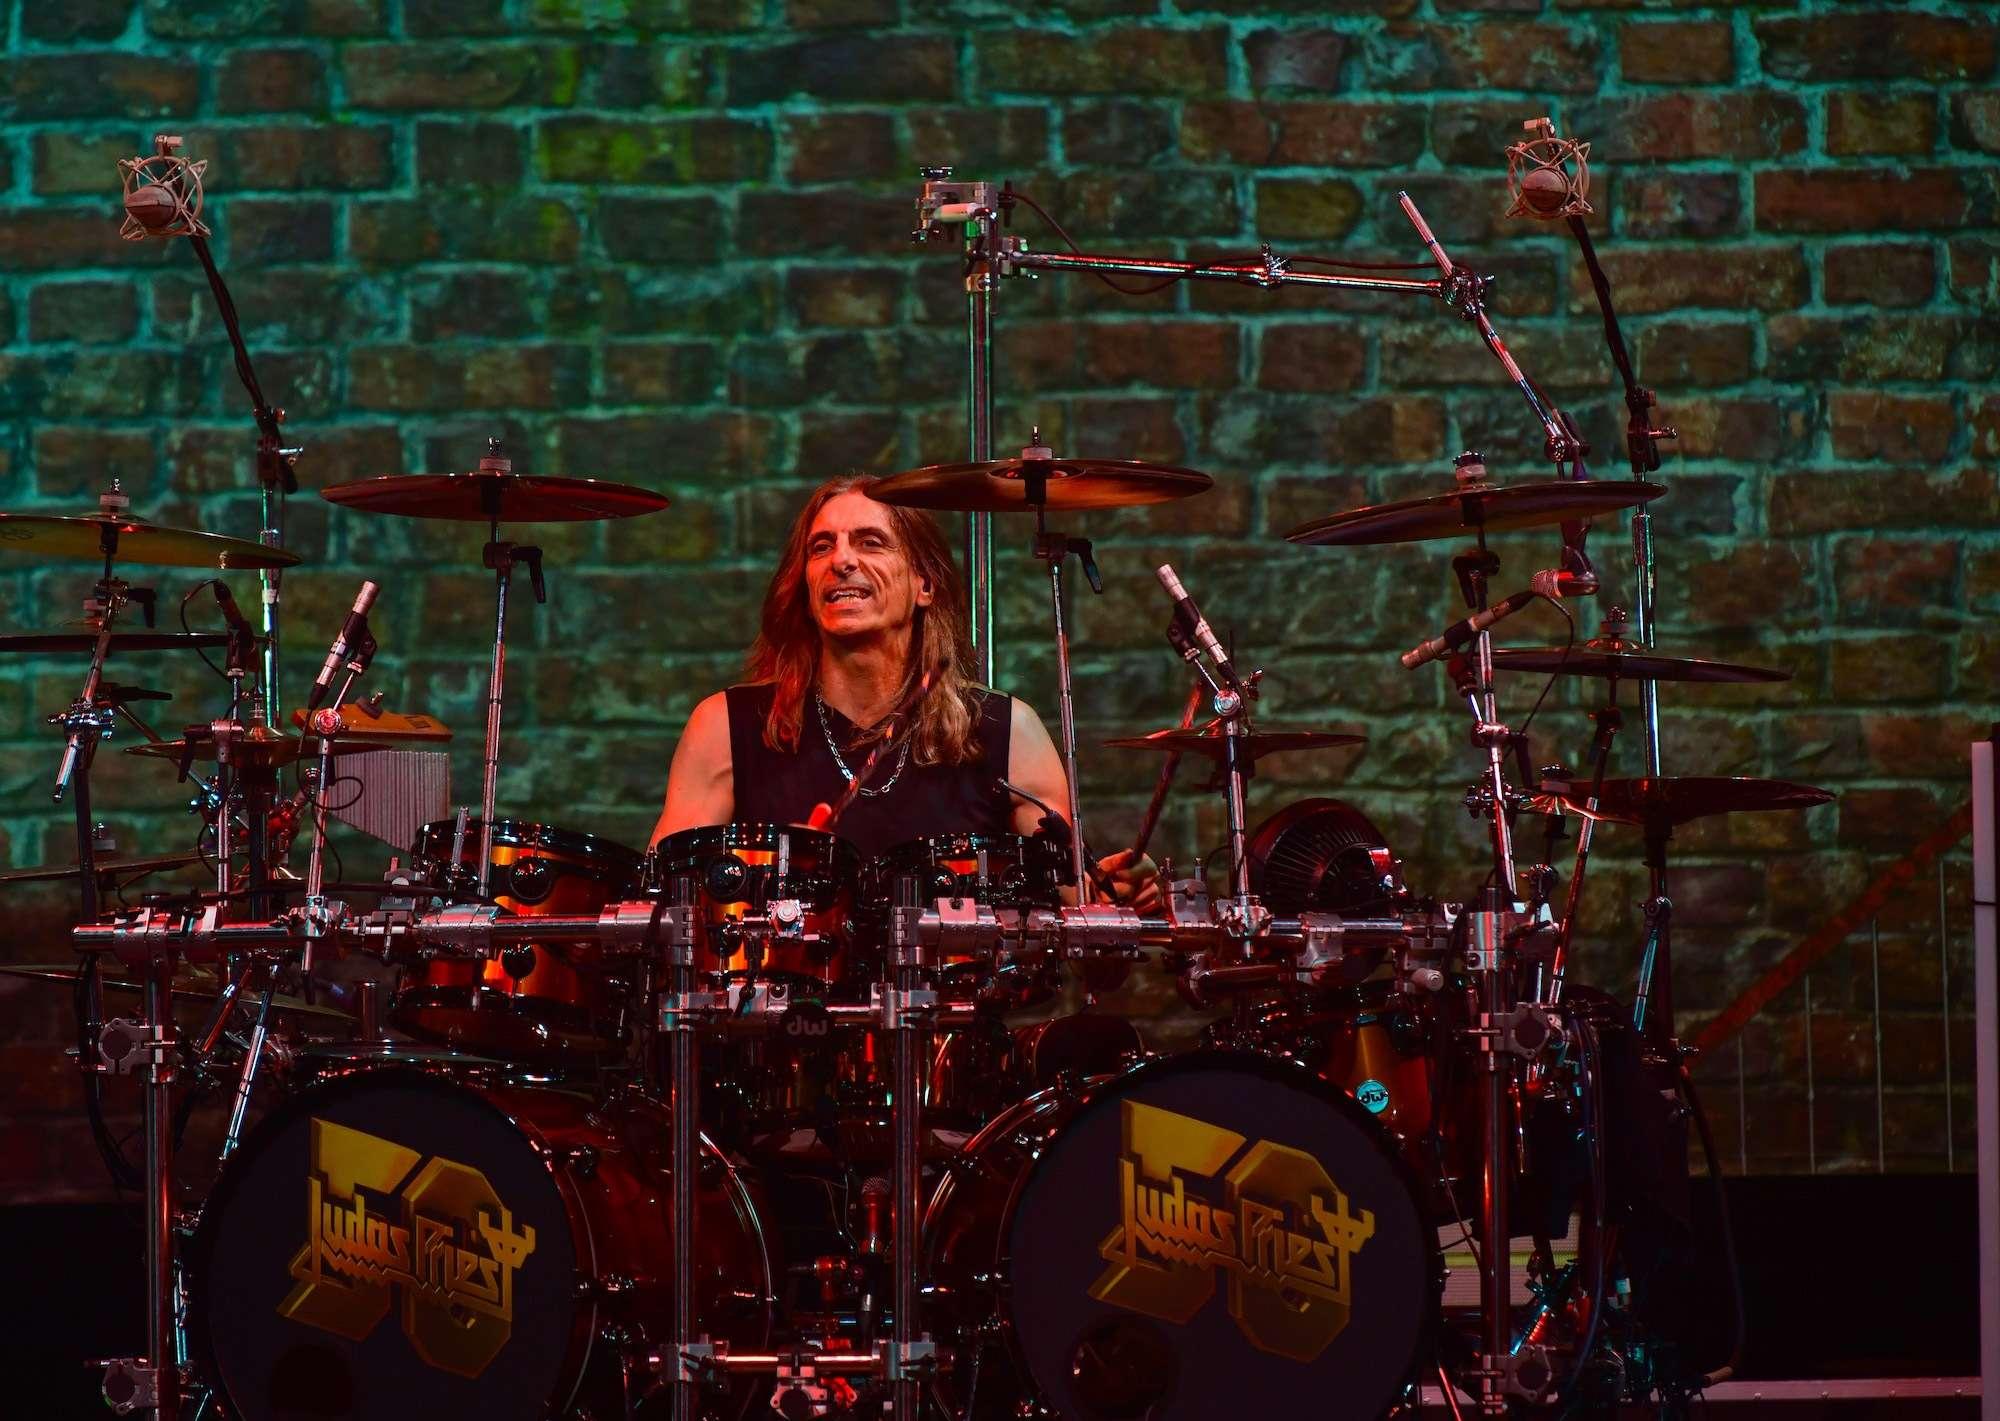 Judas Priest Live at Rosemont Theatre [GALLERY] 2